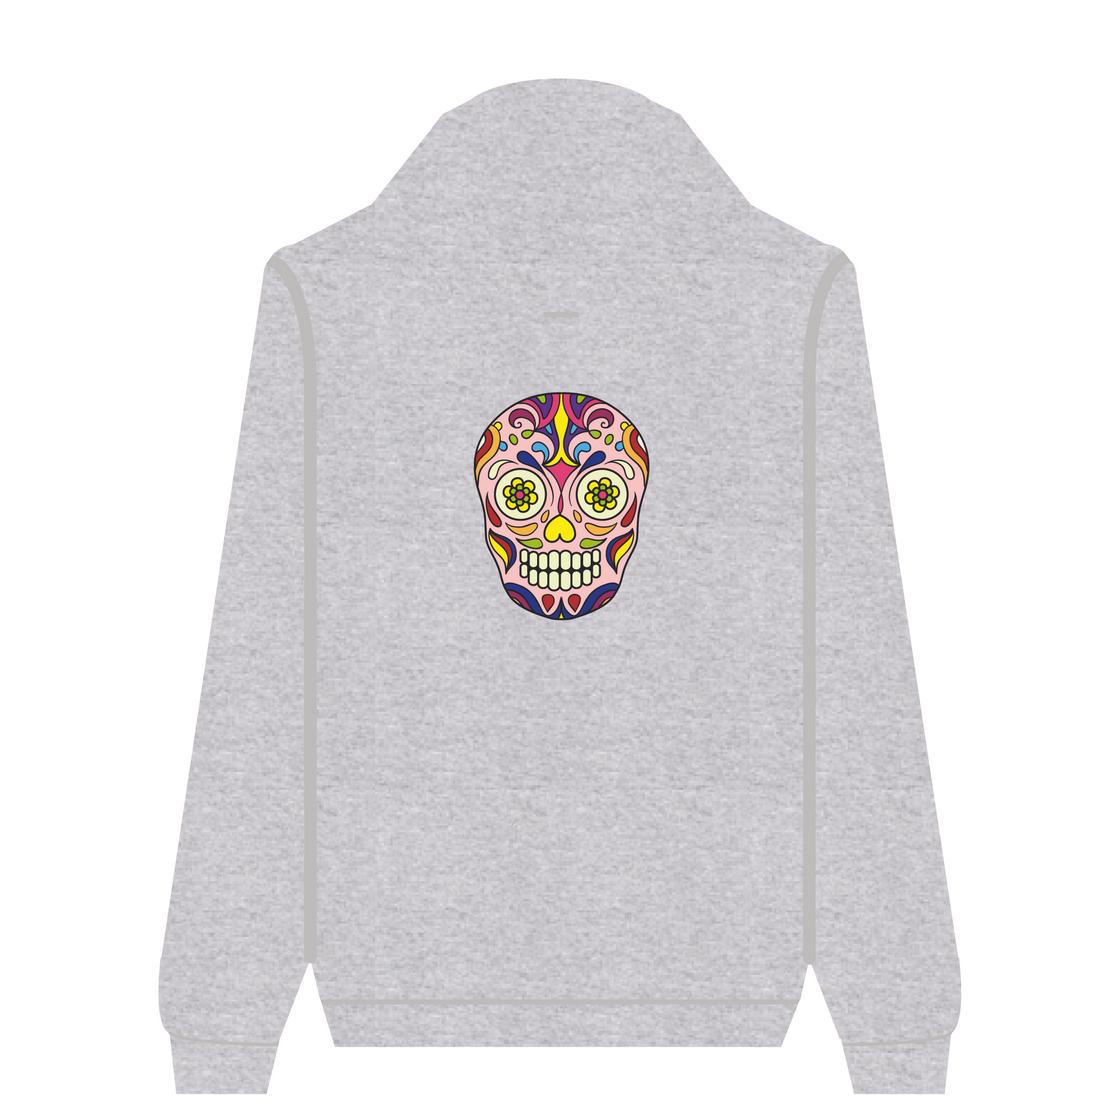 Full Zip Hoodie Pink Skull | Wuzzee